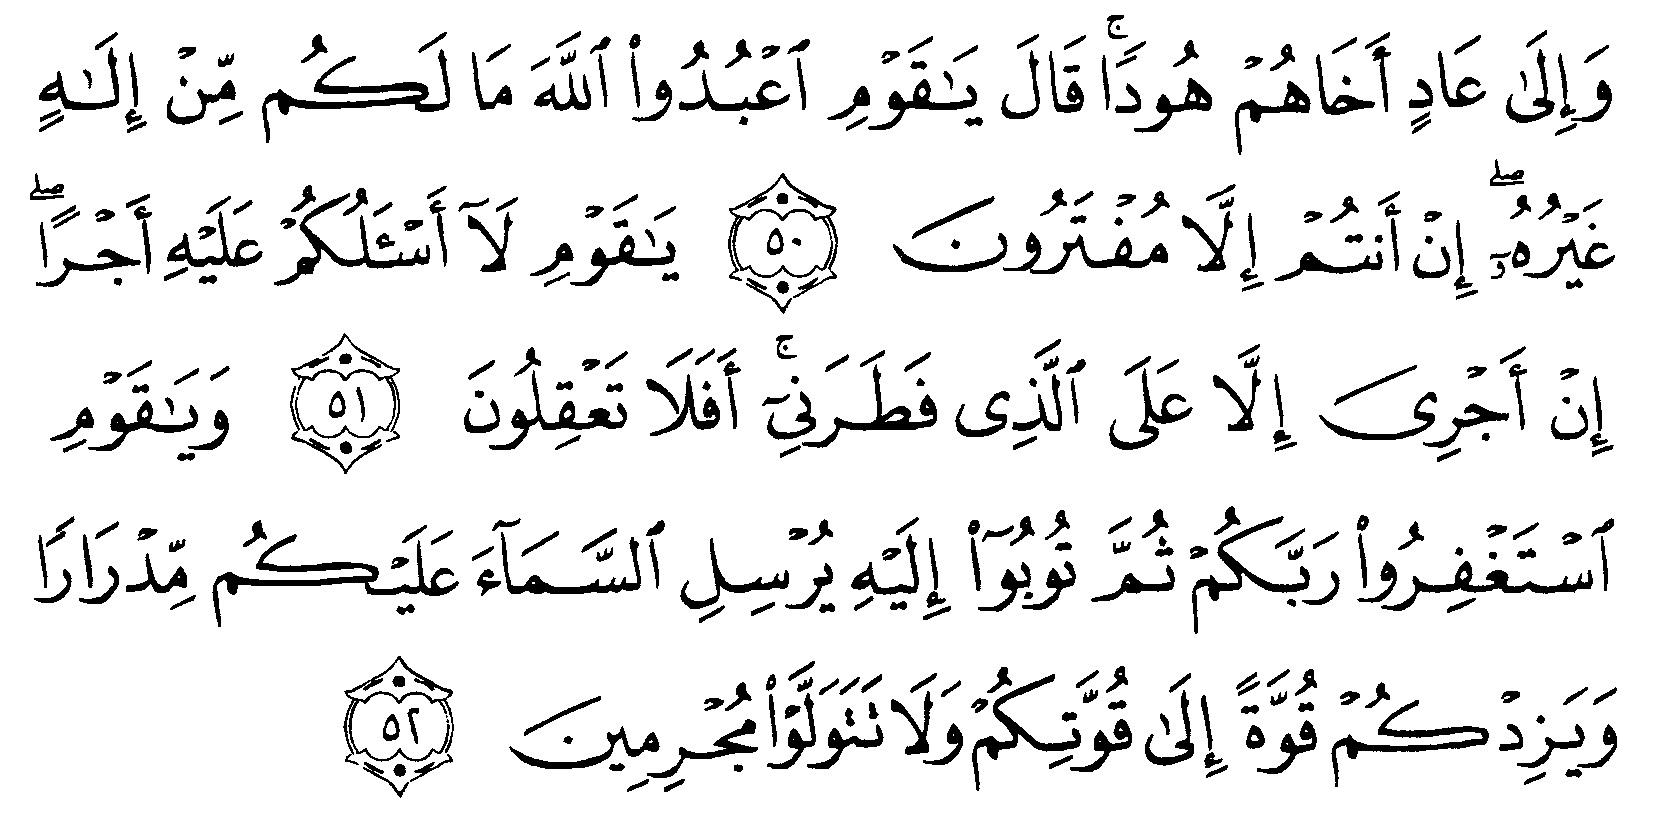 Tafsir Ibnu Katsir Surah Huud Ayat 50 52 Alquranmulia